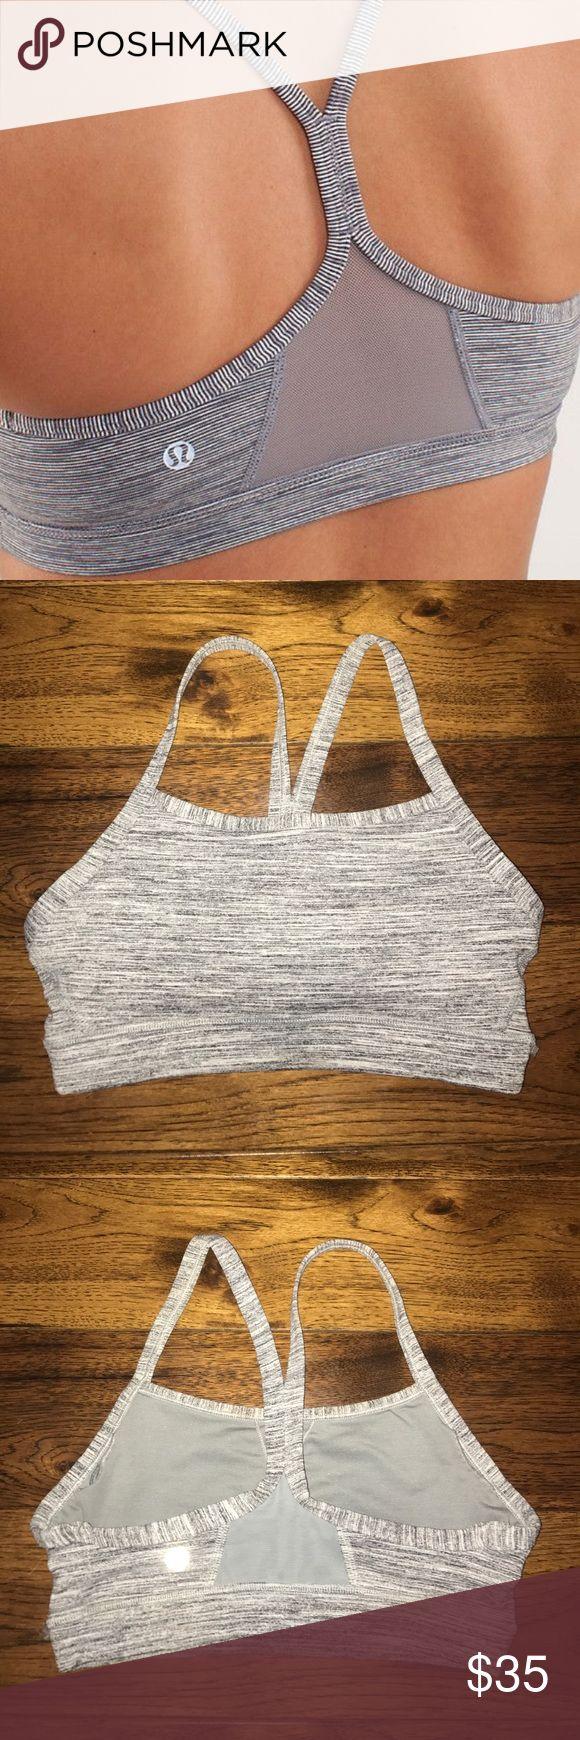 "Lululemon ""Flow Y bra IV"" Grey sports bra with mesh in the back, NEVER WORN!!! So no signs of wear!! lululemon athletica Intimates & Sleepwear Bras"